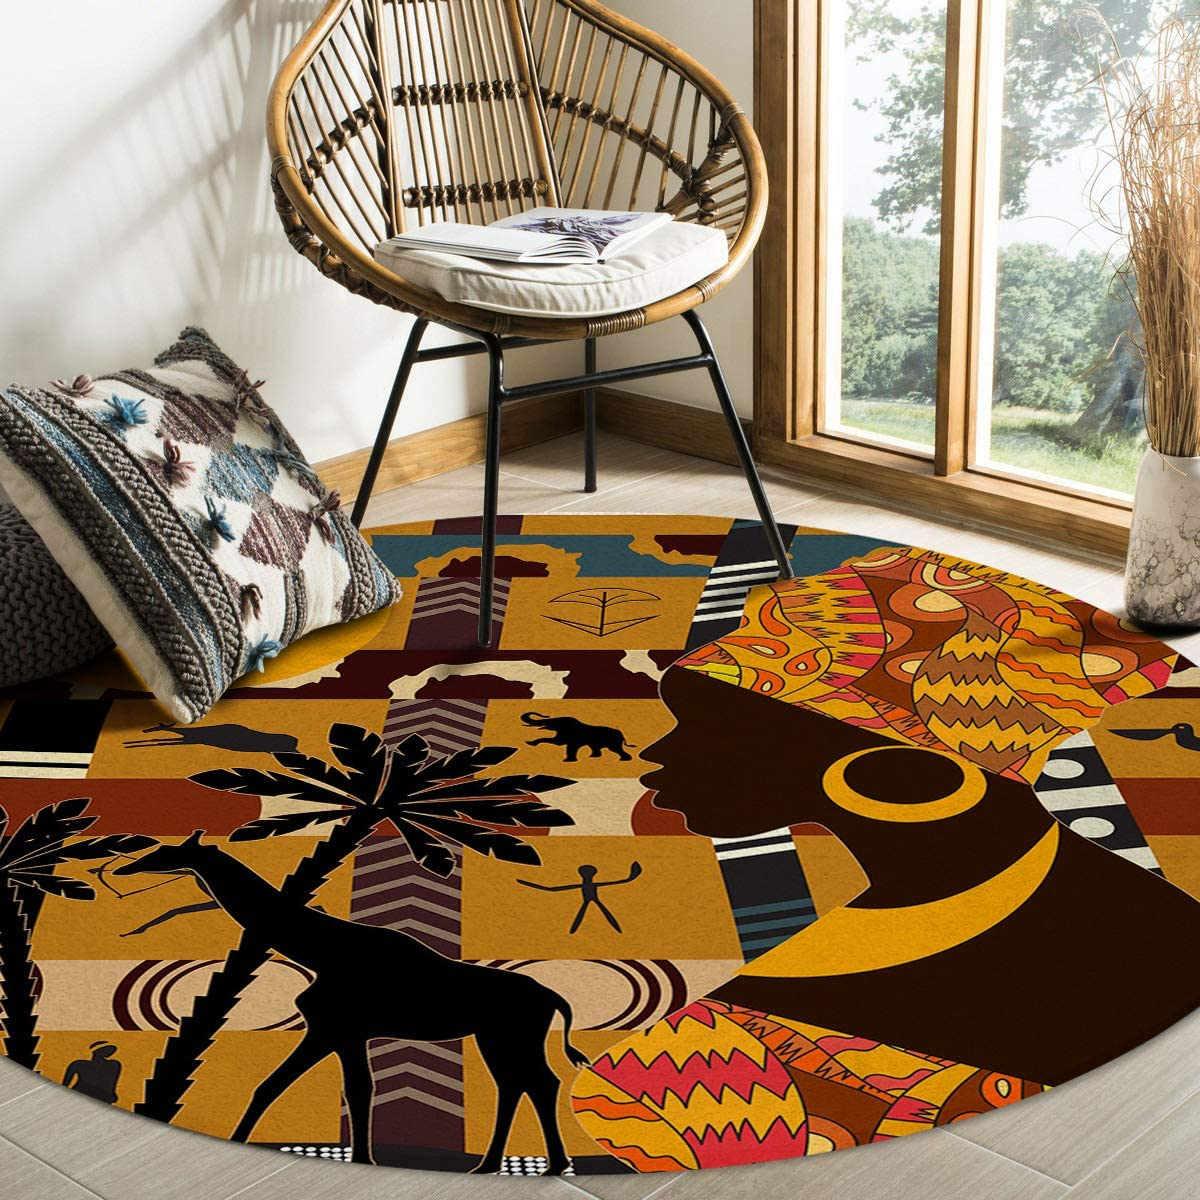 Large Area Rug for Living Room- African Women Rlephant Giraffe Silhouette Soft Comfort Carpet Home Decorate Contemporary Runner Rugs, 3.3' Diameter